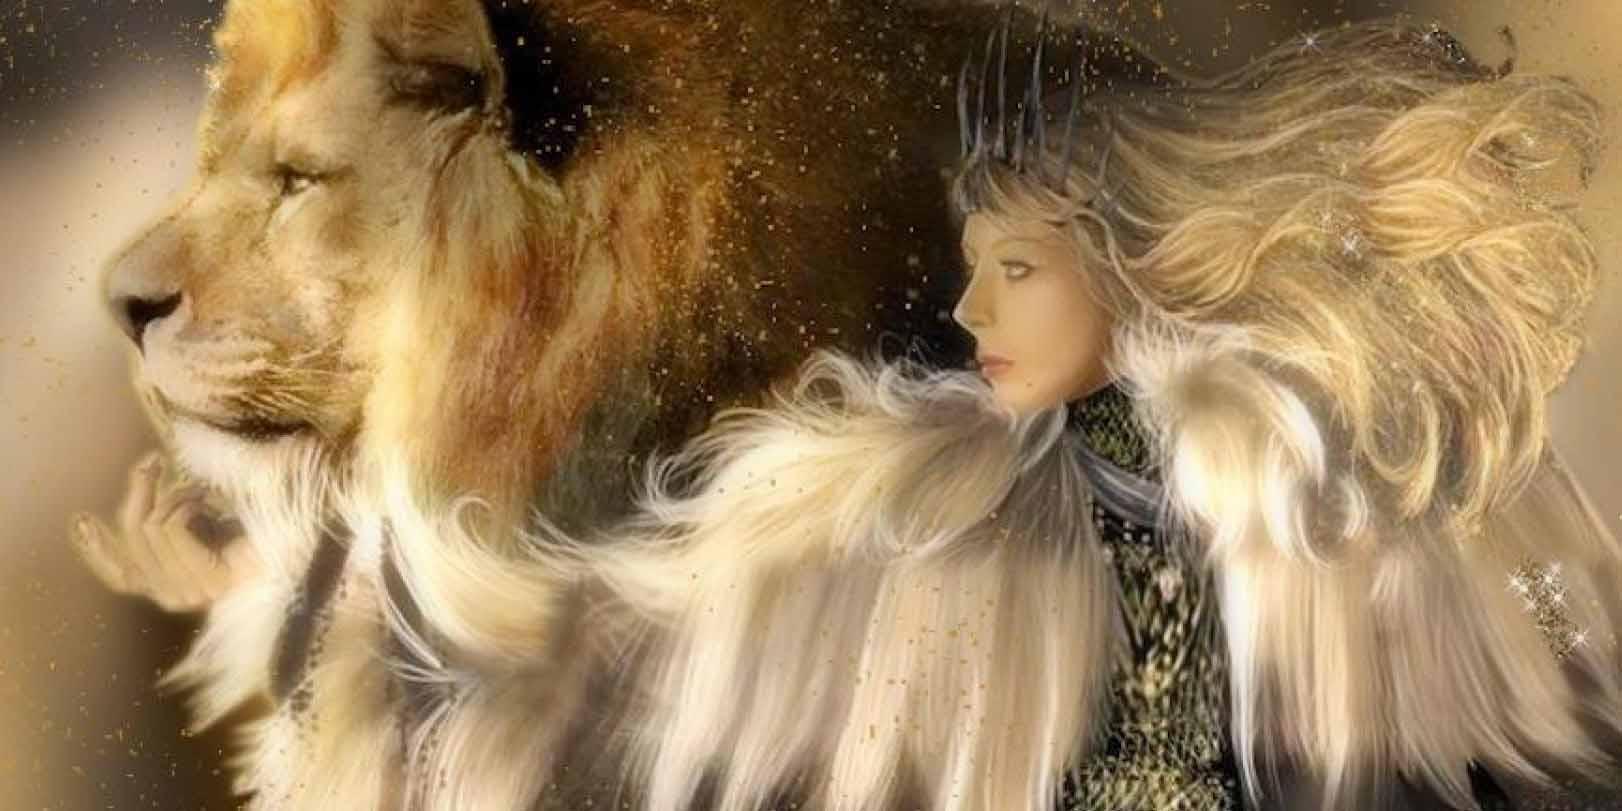 Красивое фото со Львом и девушкой